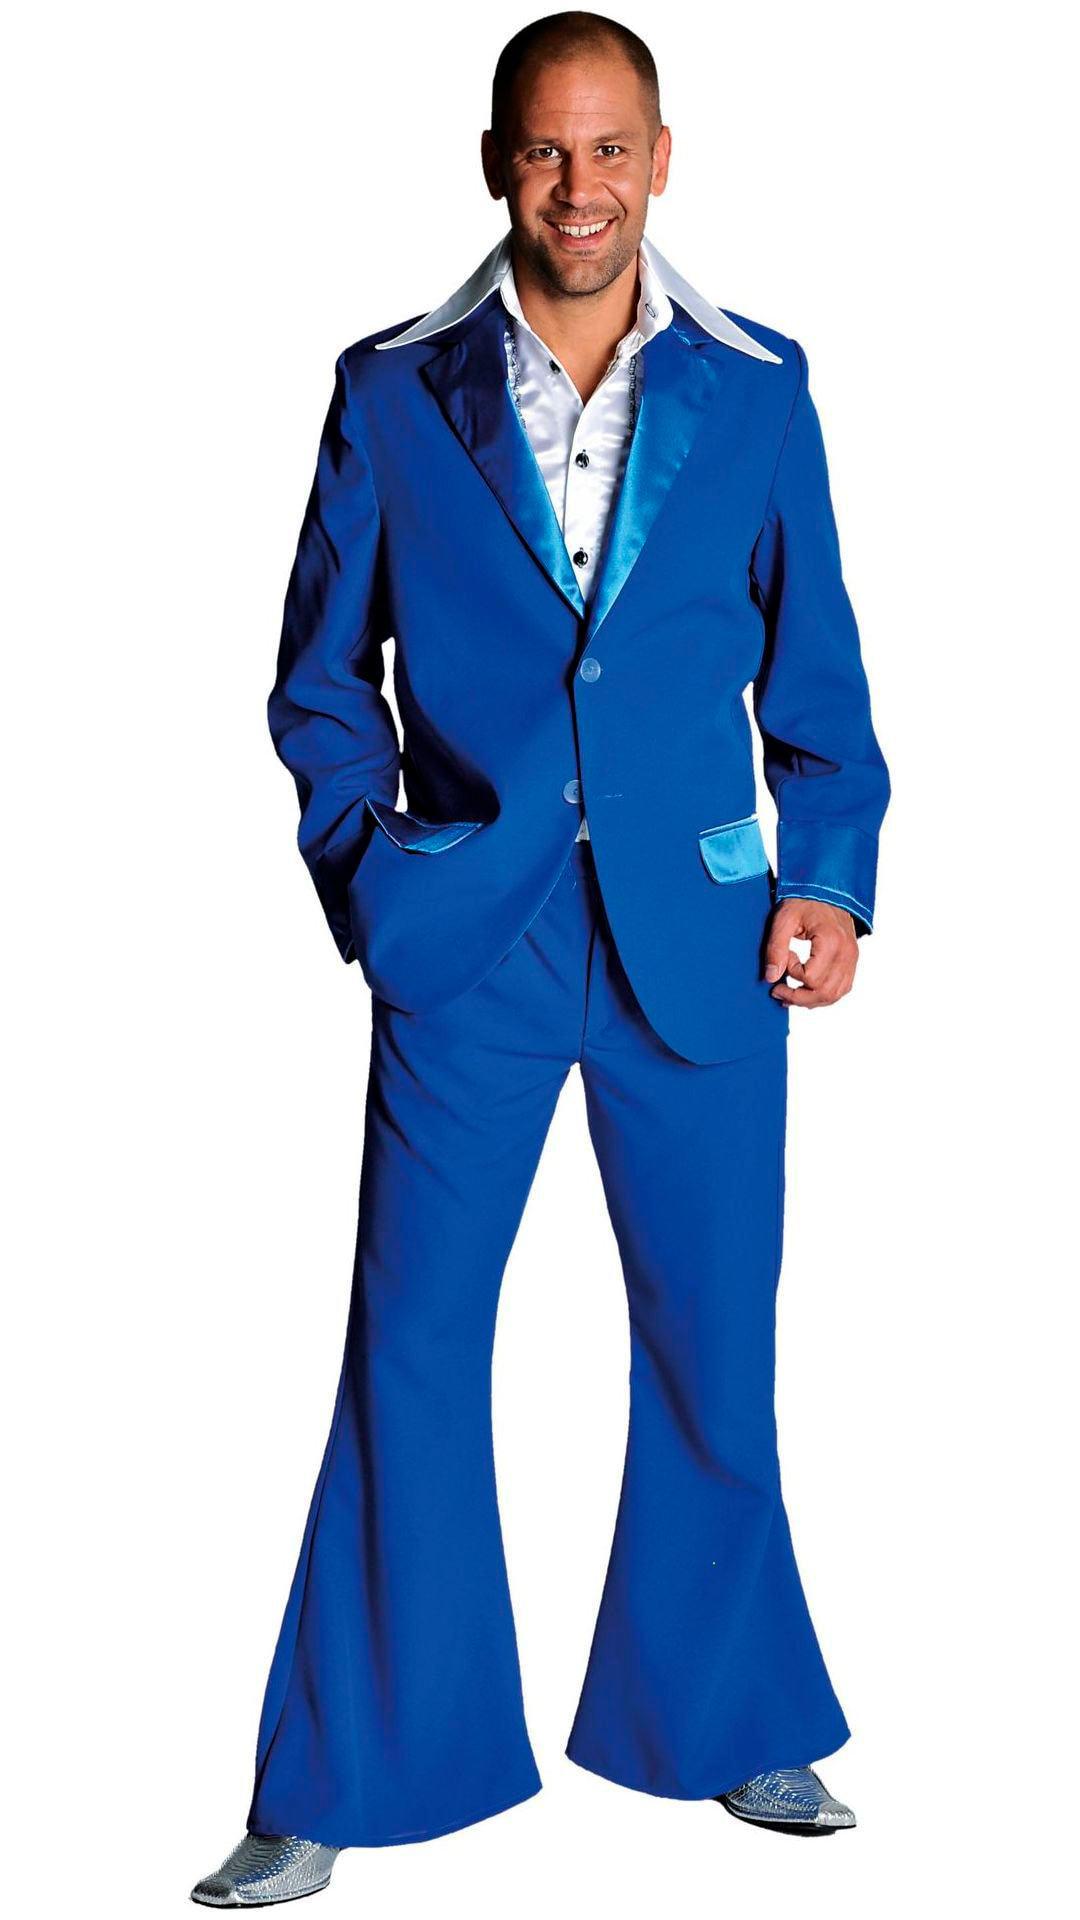 70s pak kobalt blauw